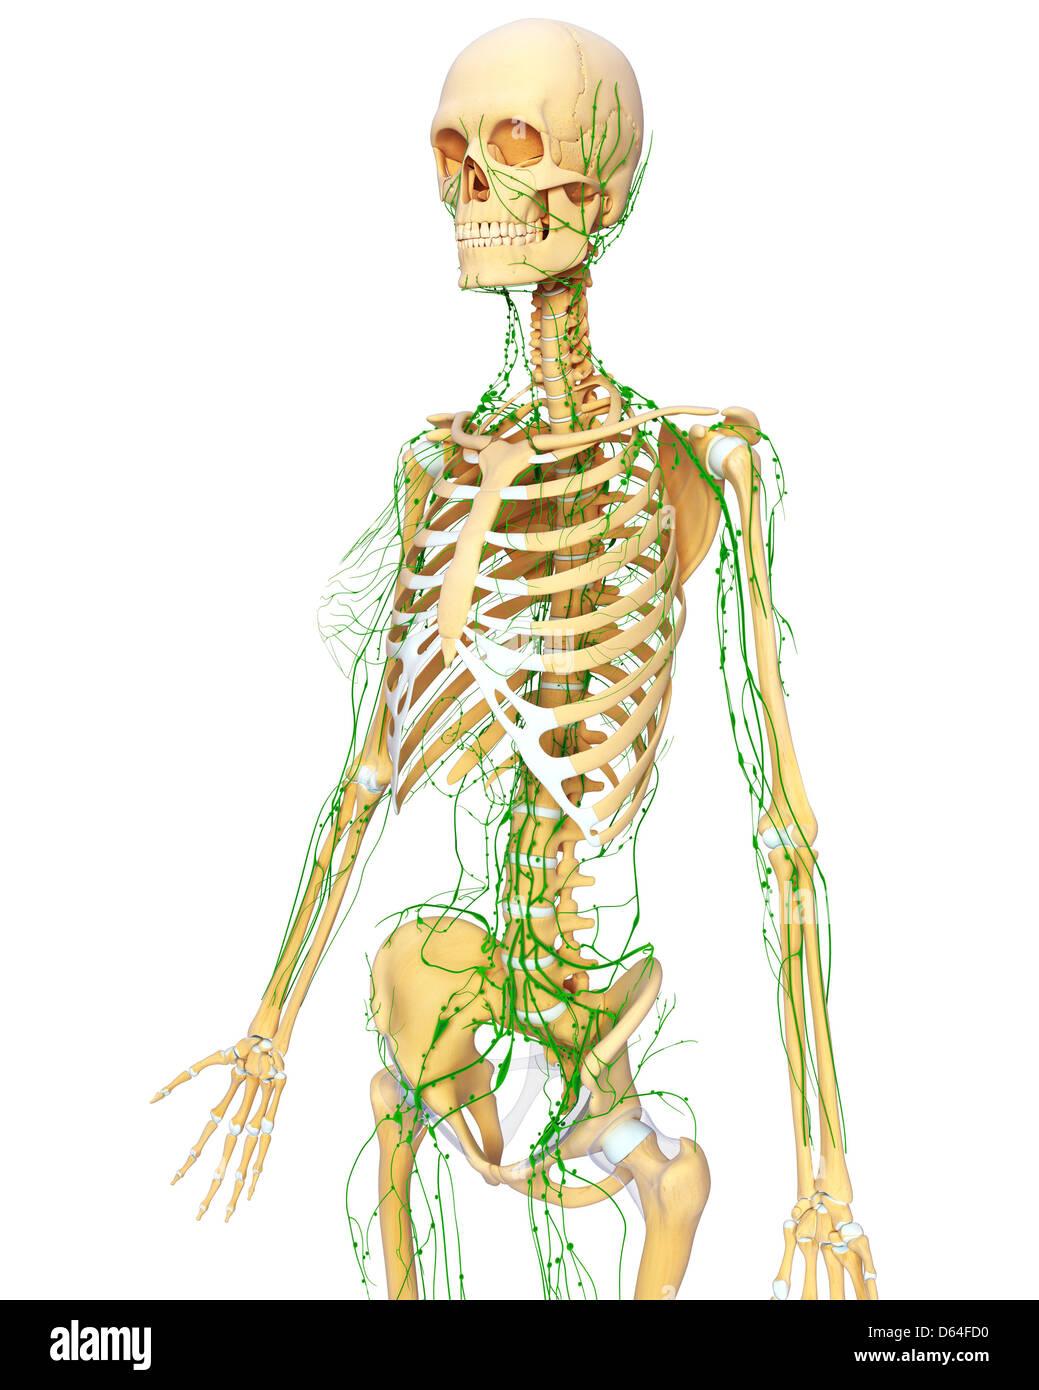 hight resolution of human anatomy artwork stock image